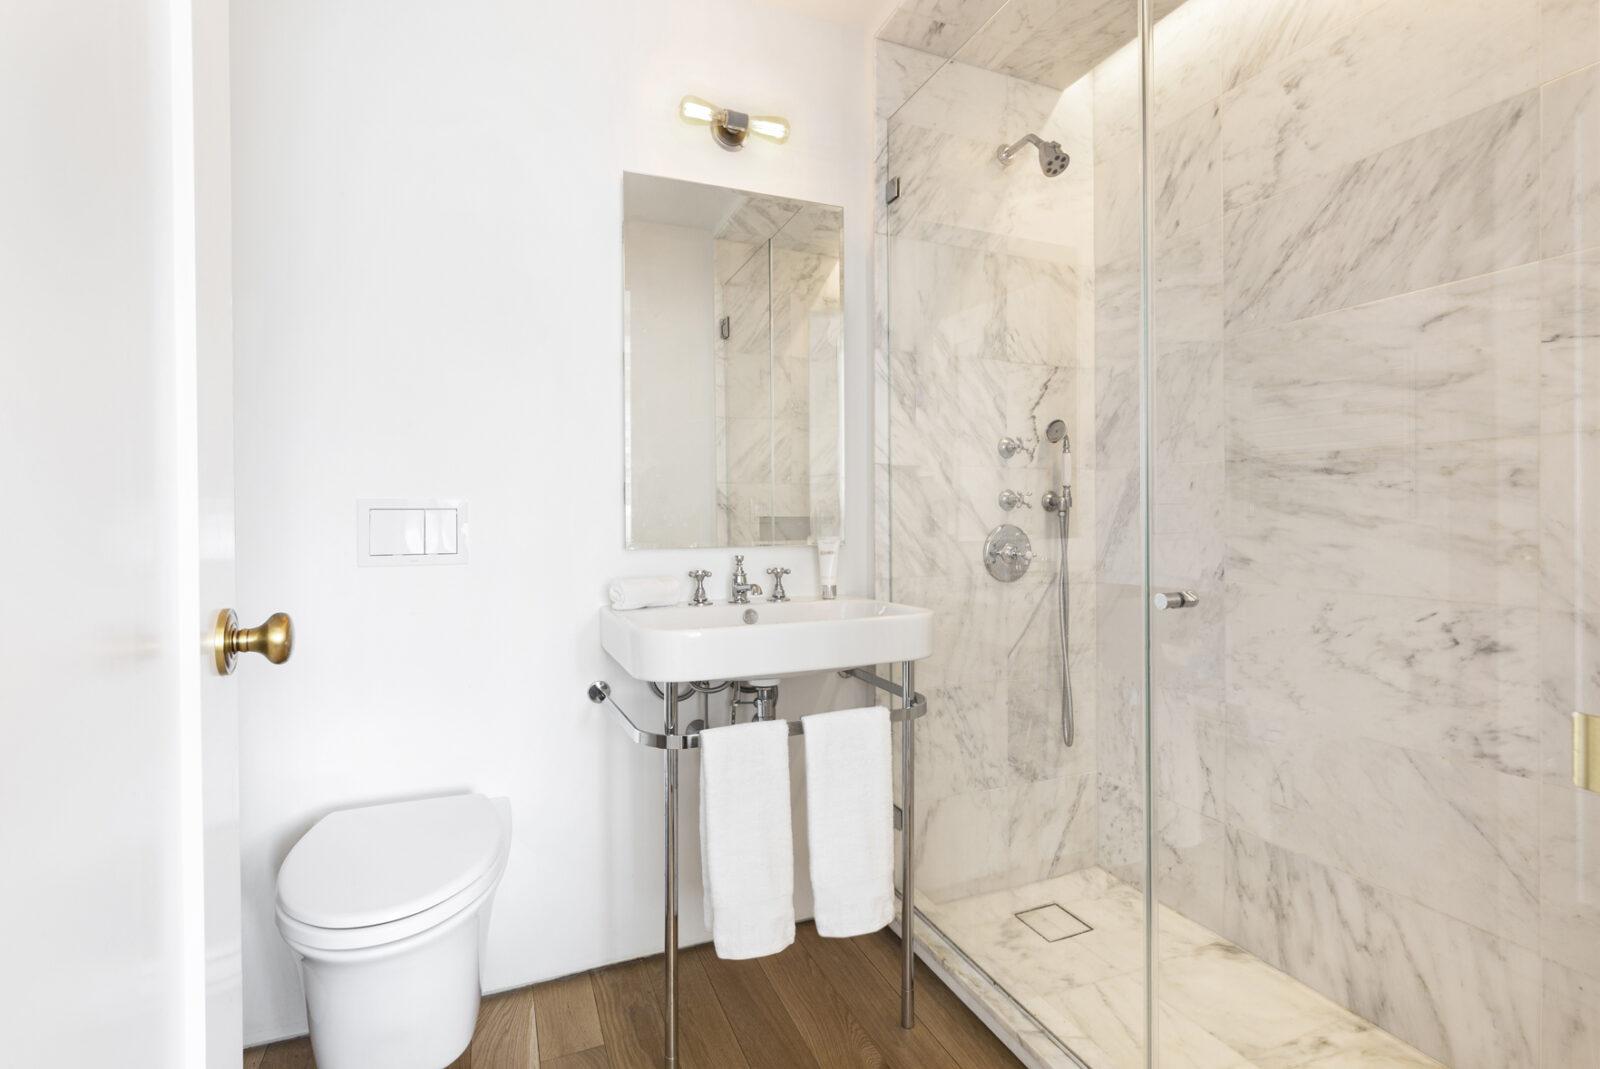 bathroom inside leroy neiman's former manhattan home